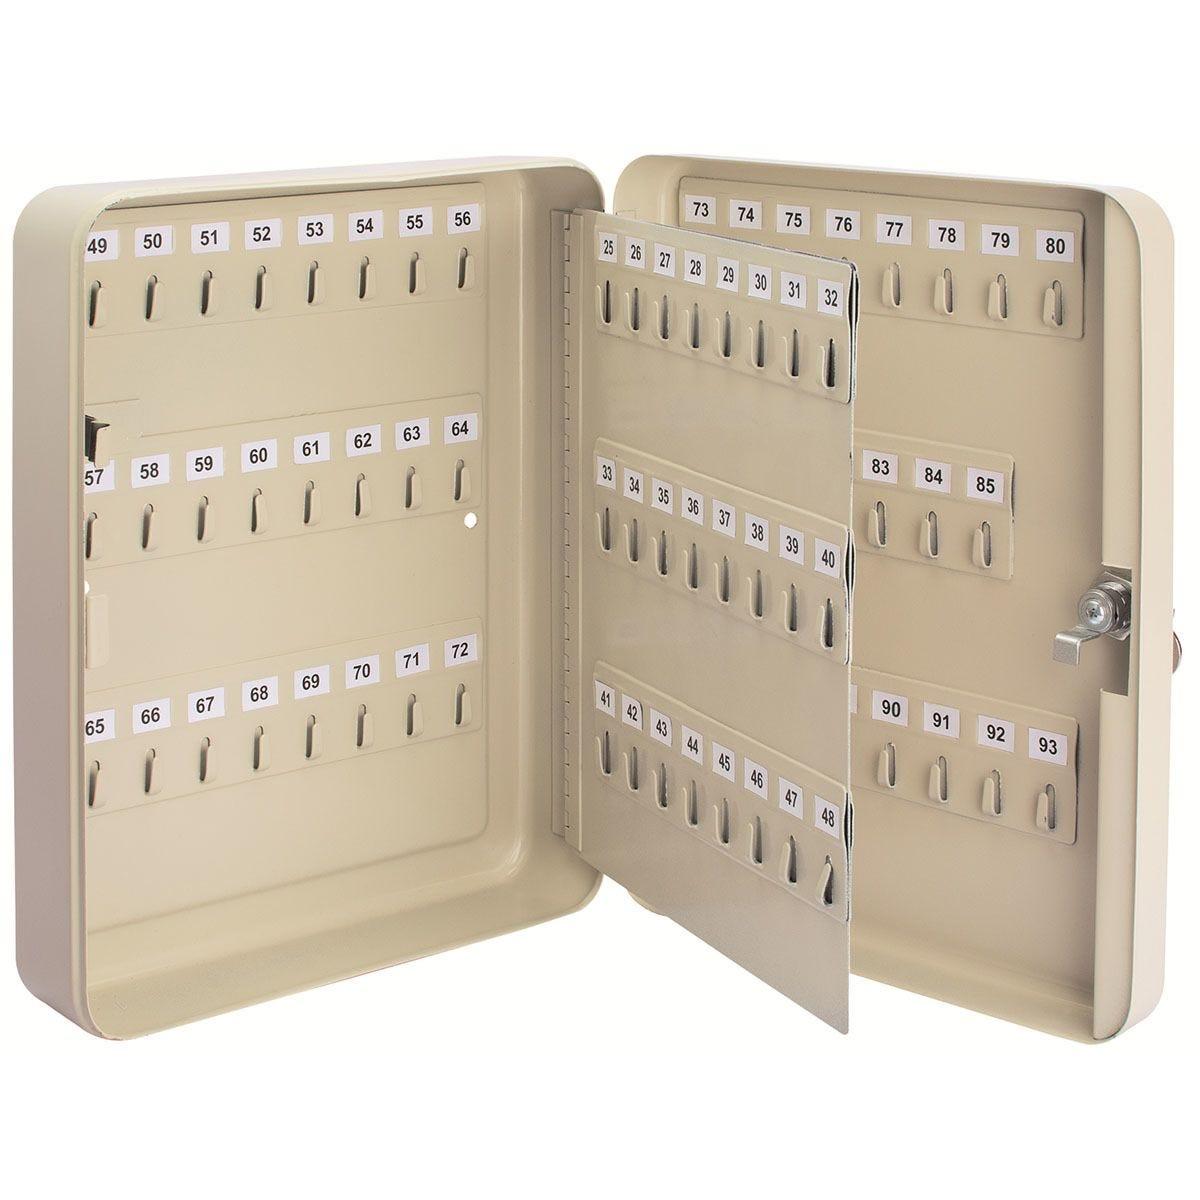 Draper 93 Hooks Key Cabinet - Cream